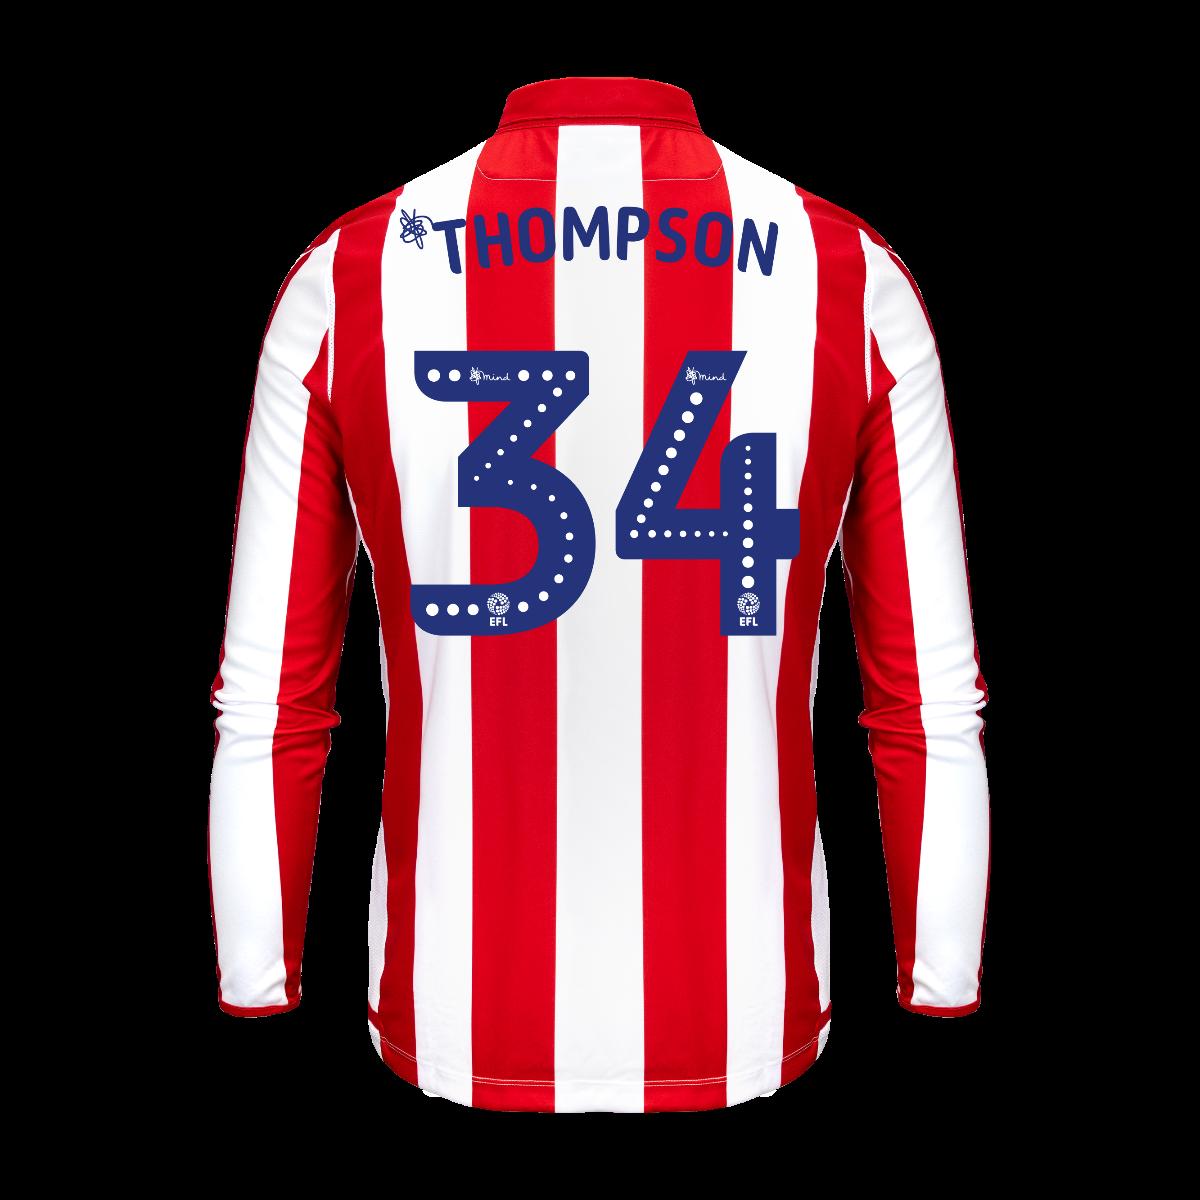 2019/20 Junior Home LS Shirt - Thompson